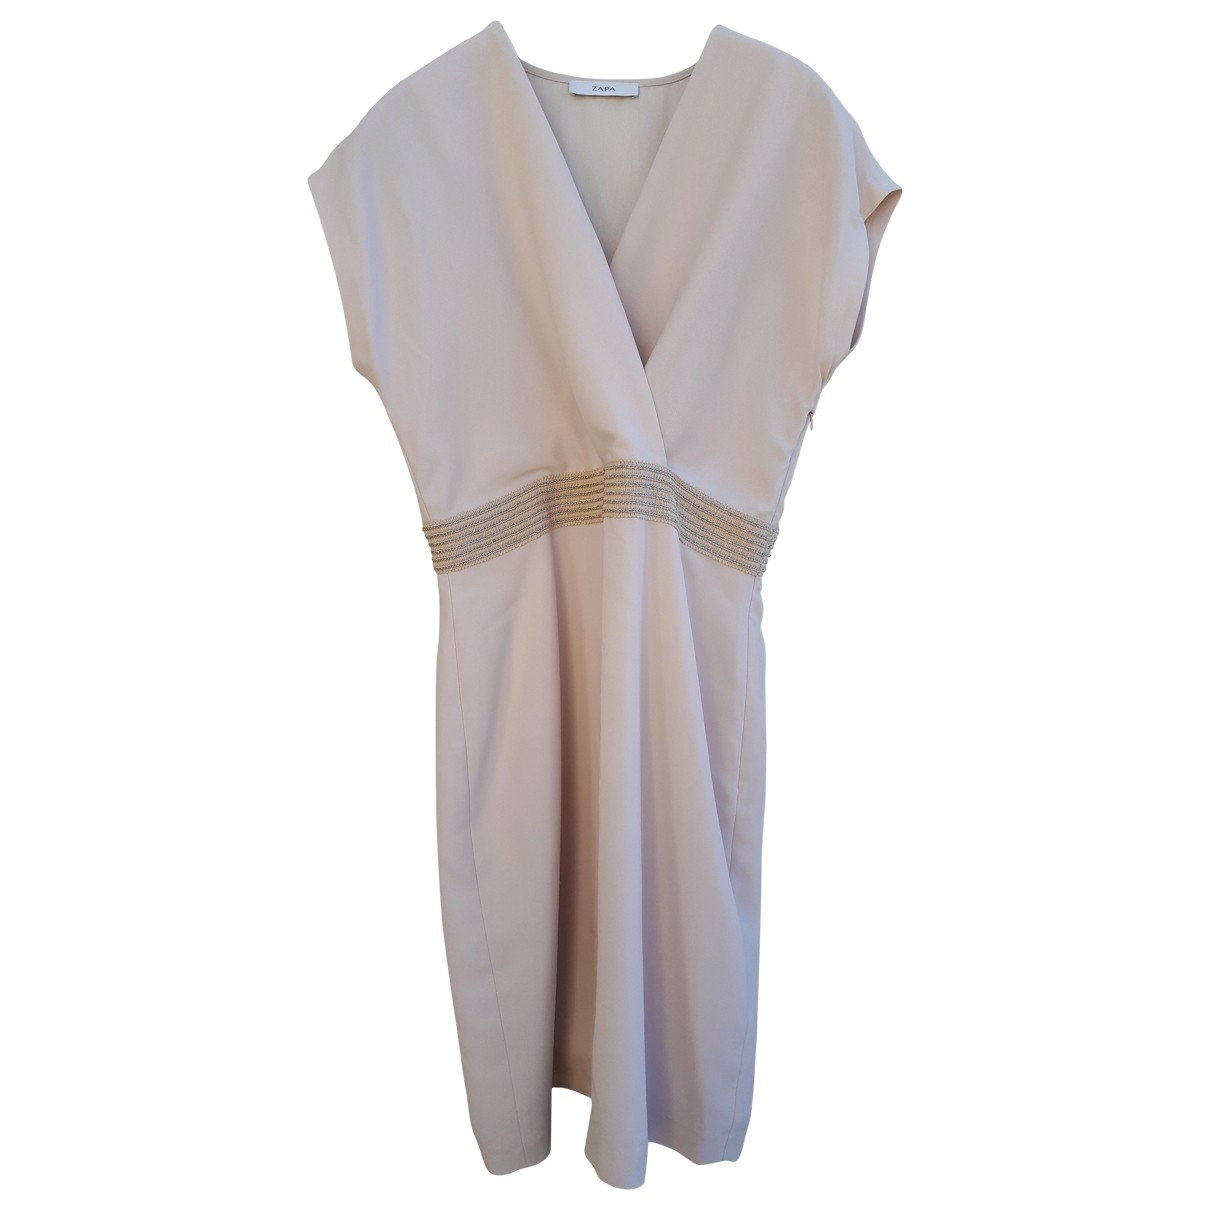 Zapa \N Kleid in  Rosa Polyester